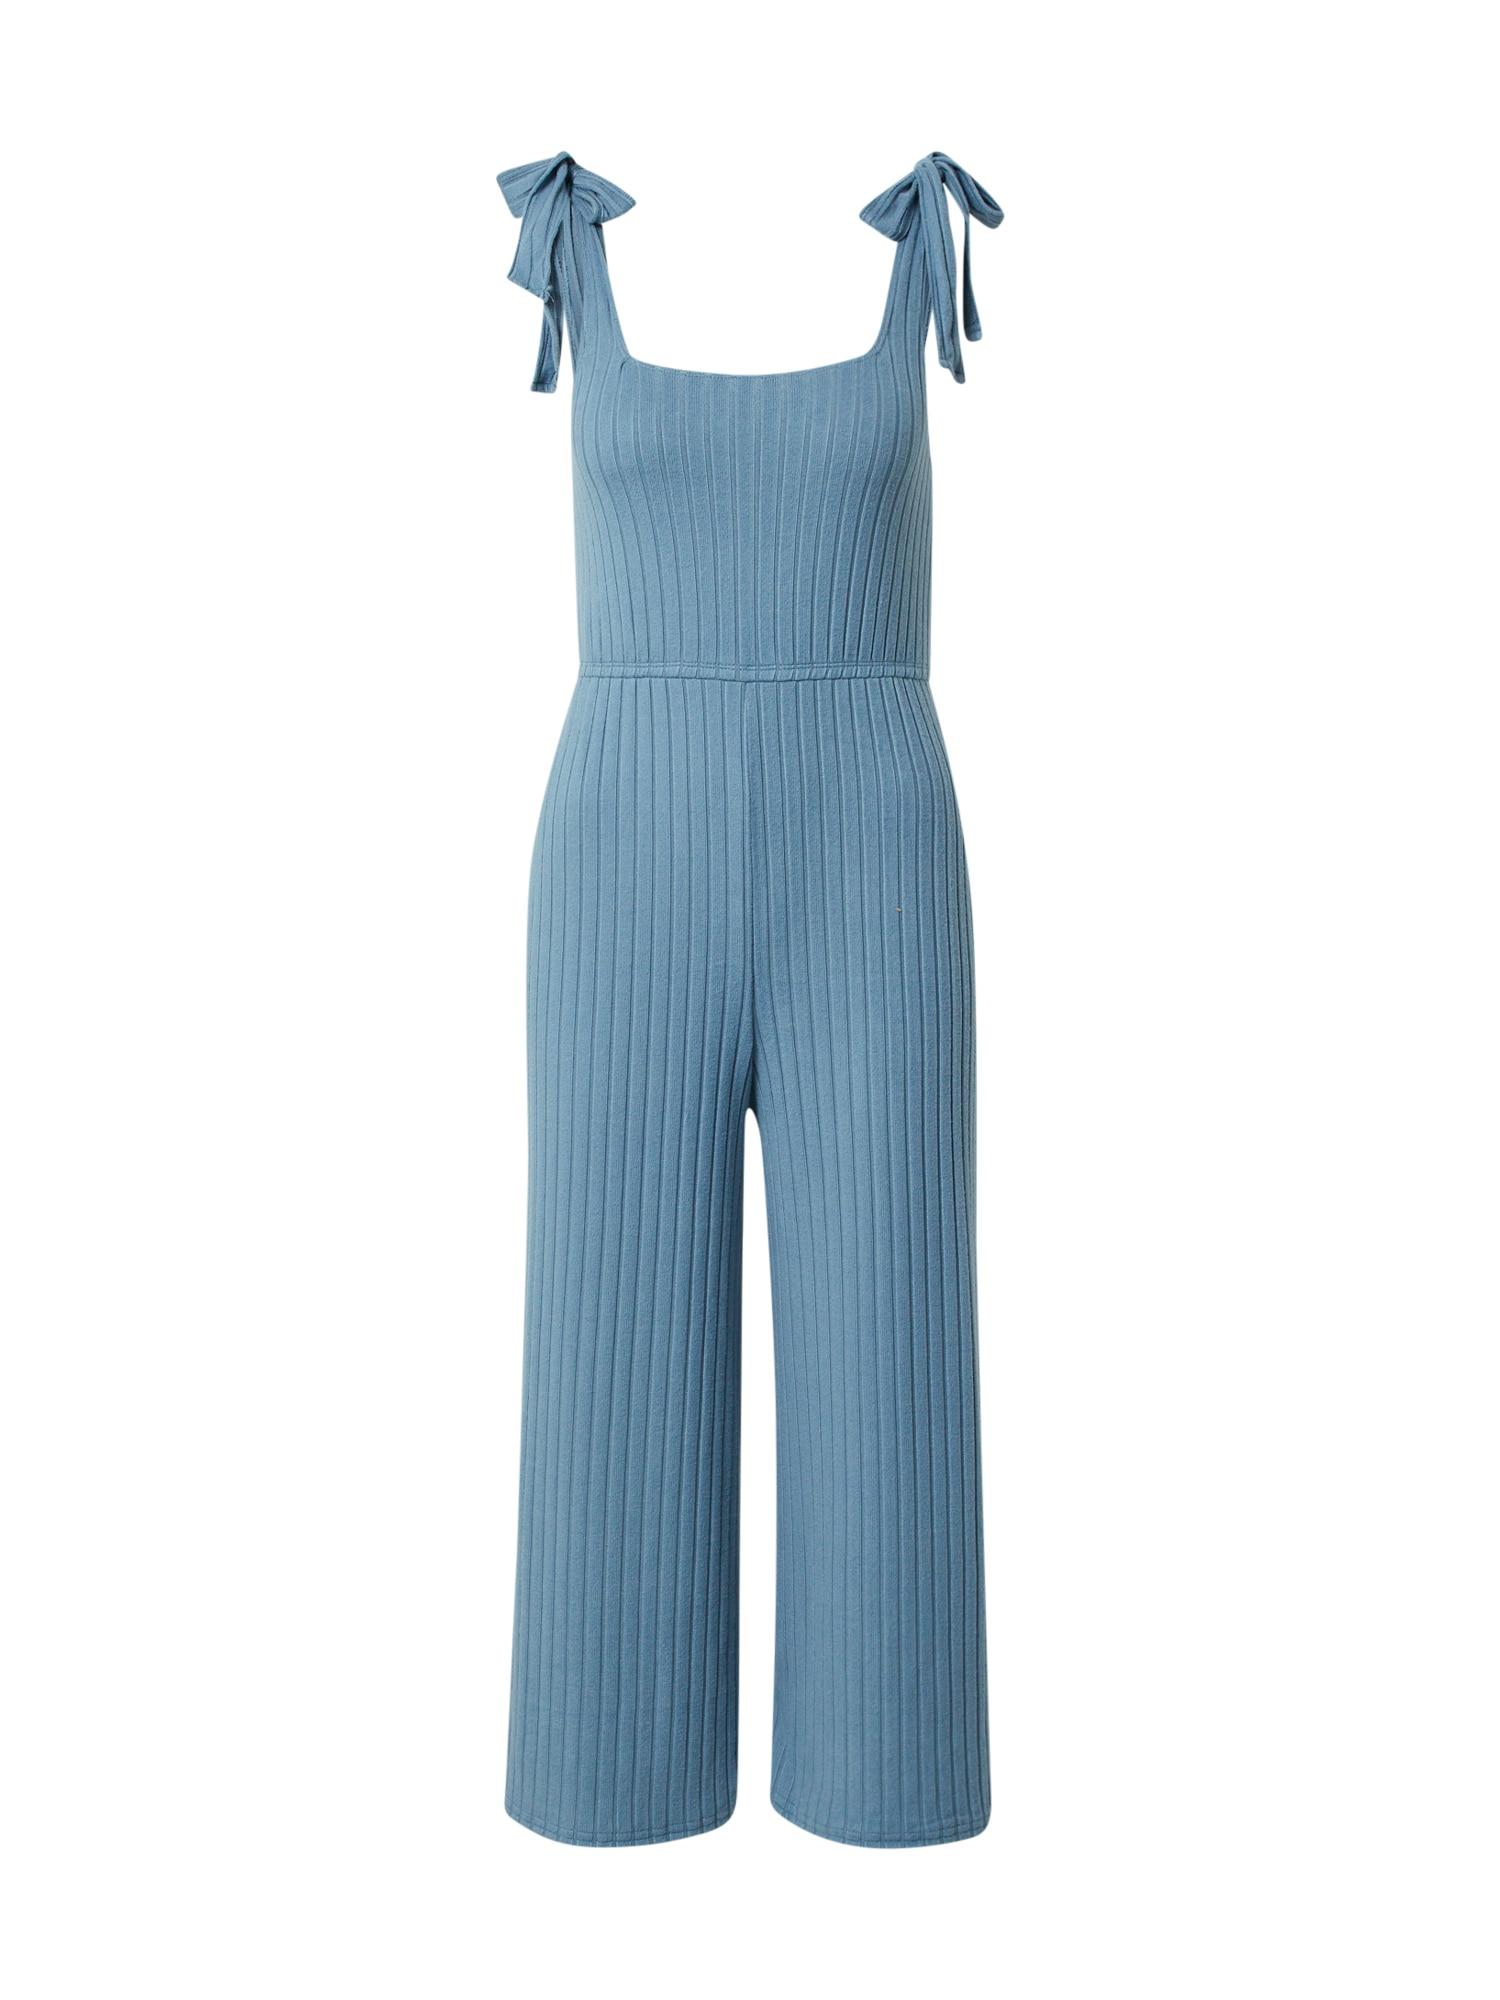 Gilly Hicks Vienos dalies kostiumas mėlyna dūmų spalva